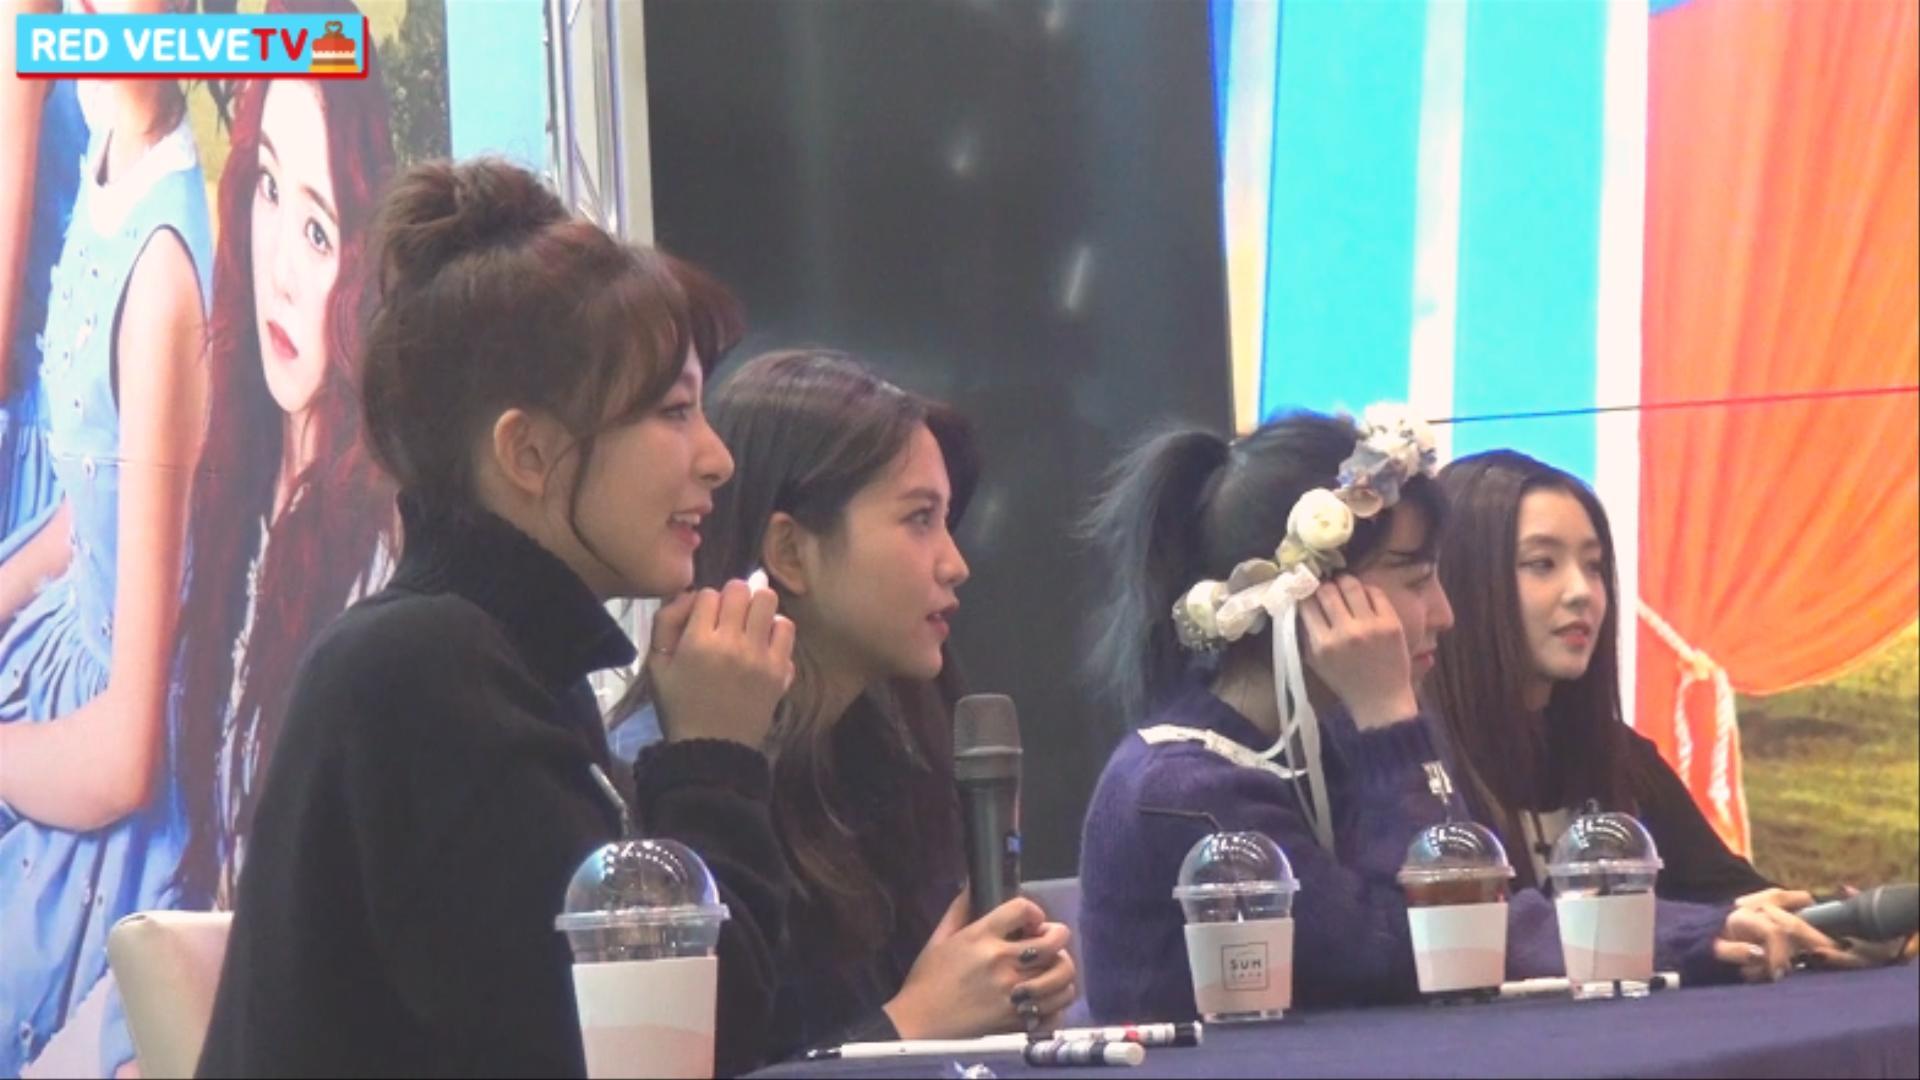 [Red VelveTV] 레드벨벳 'Rookie' 발매 기념 사인회 현장 2